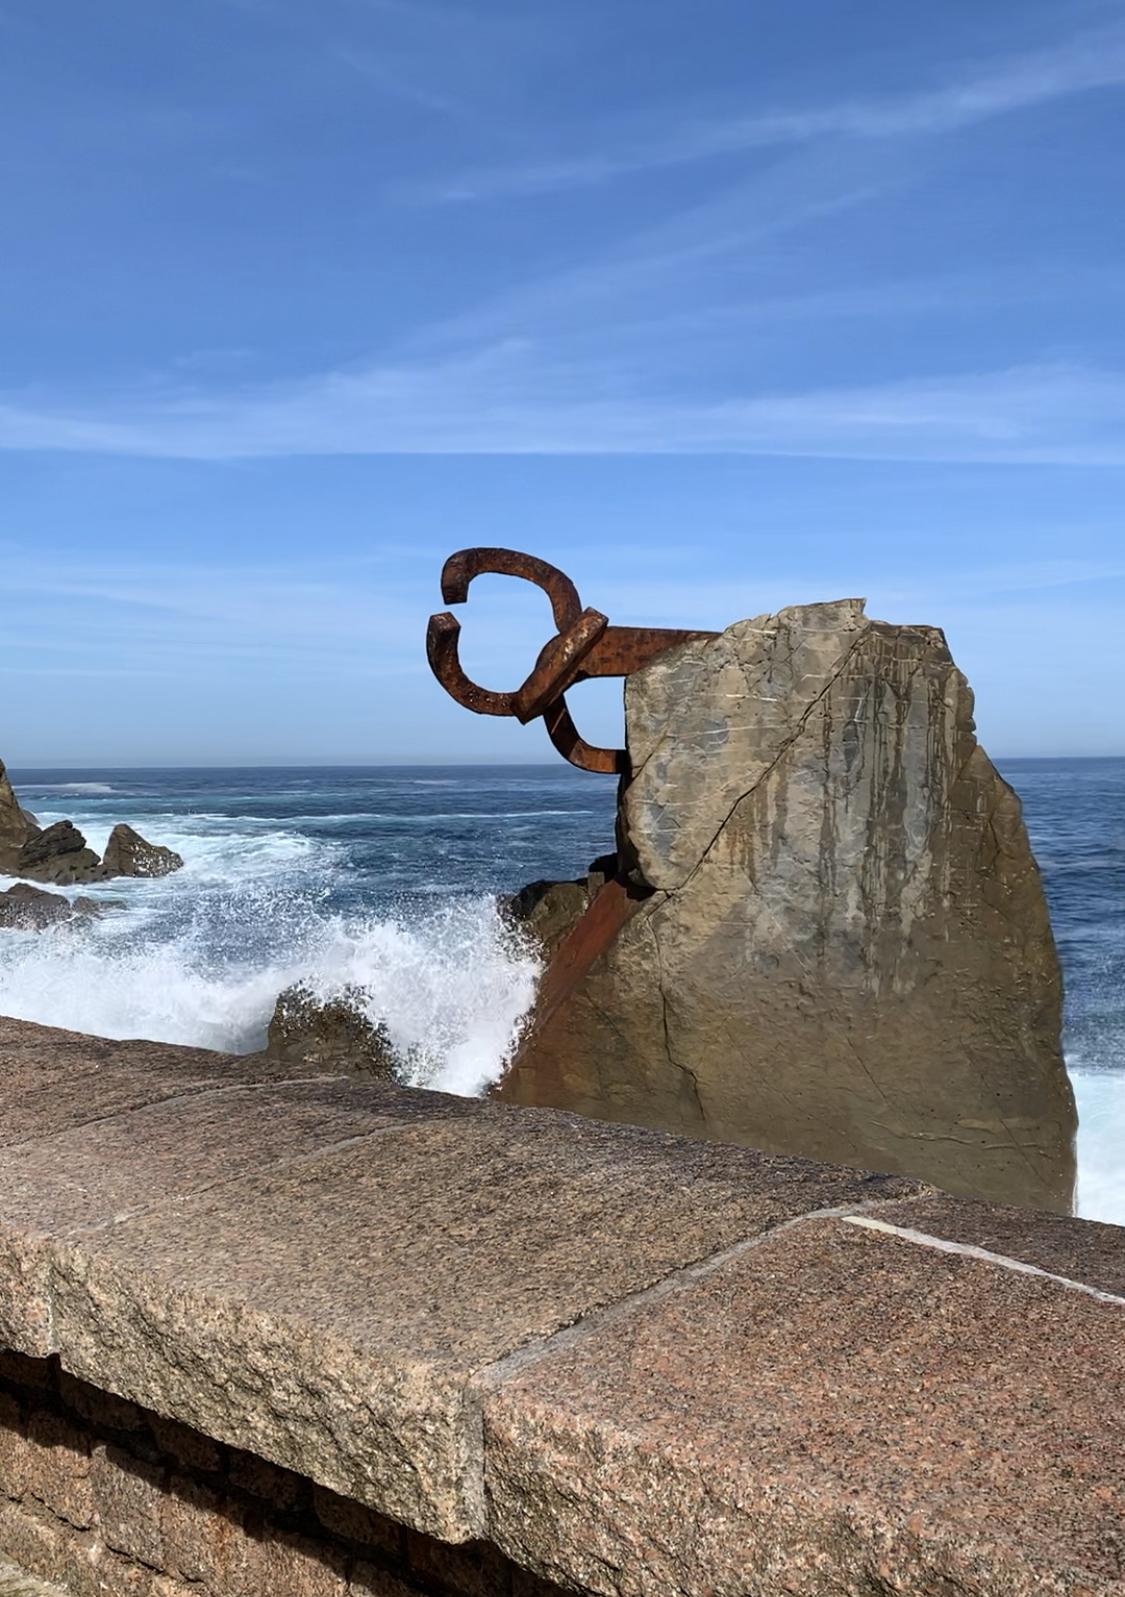 San Sebastian Spain-Comb of the Wind